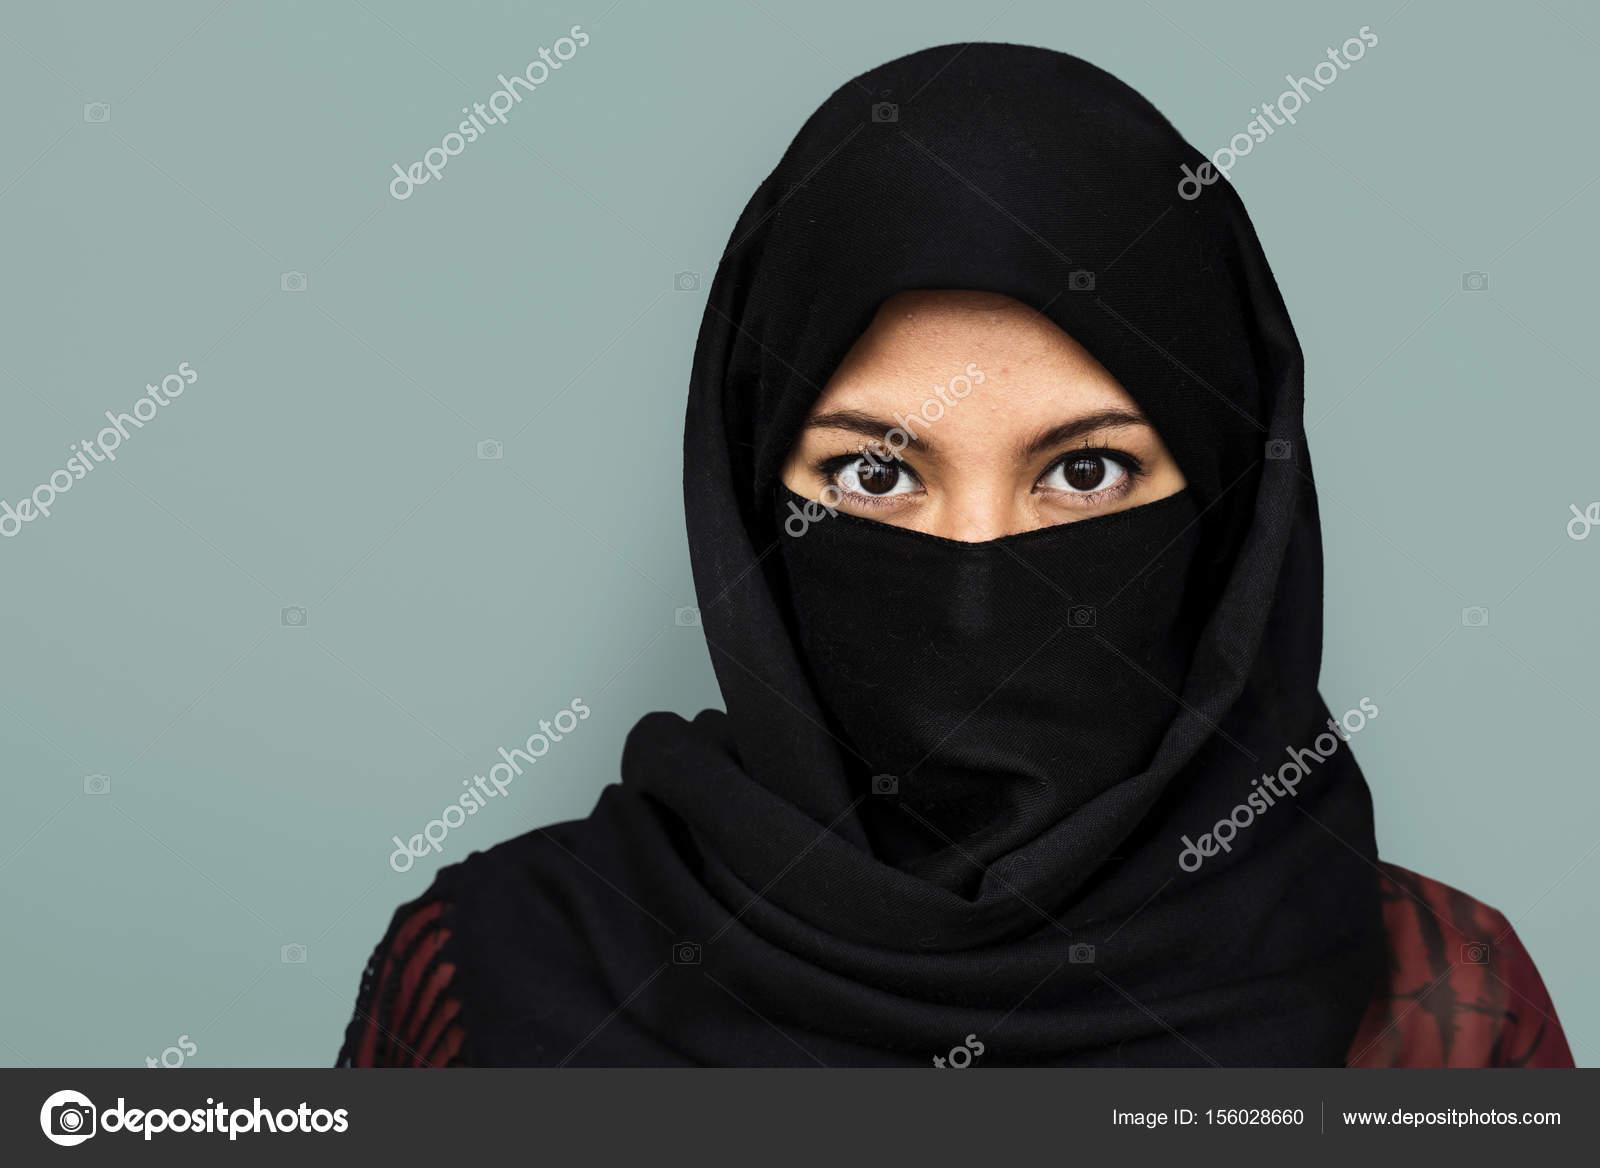 purdah のイスラム教徒の女性 ストック写真 rawpixel 156028660